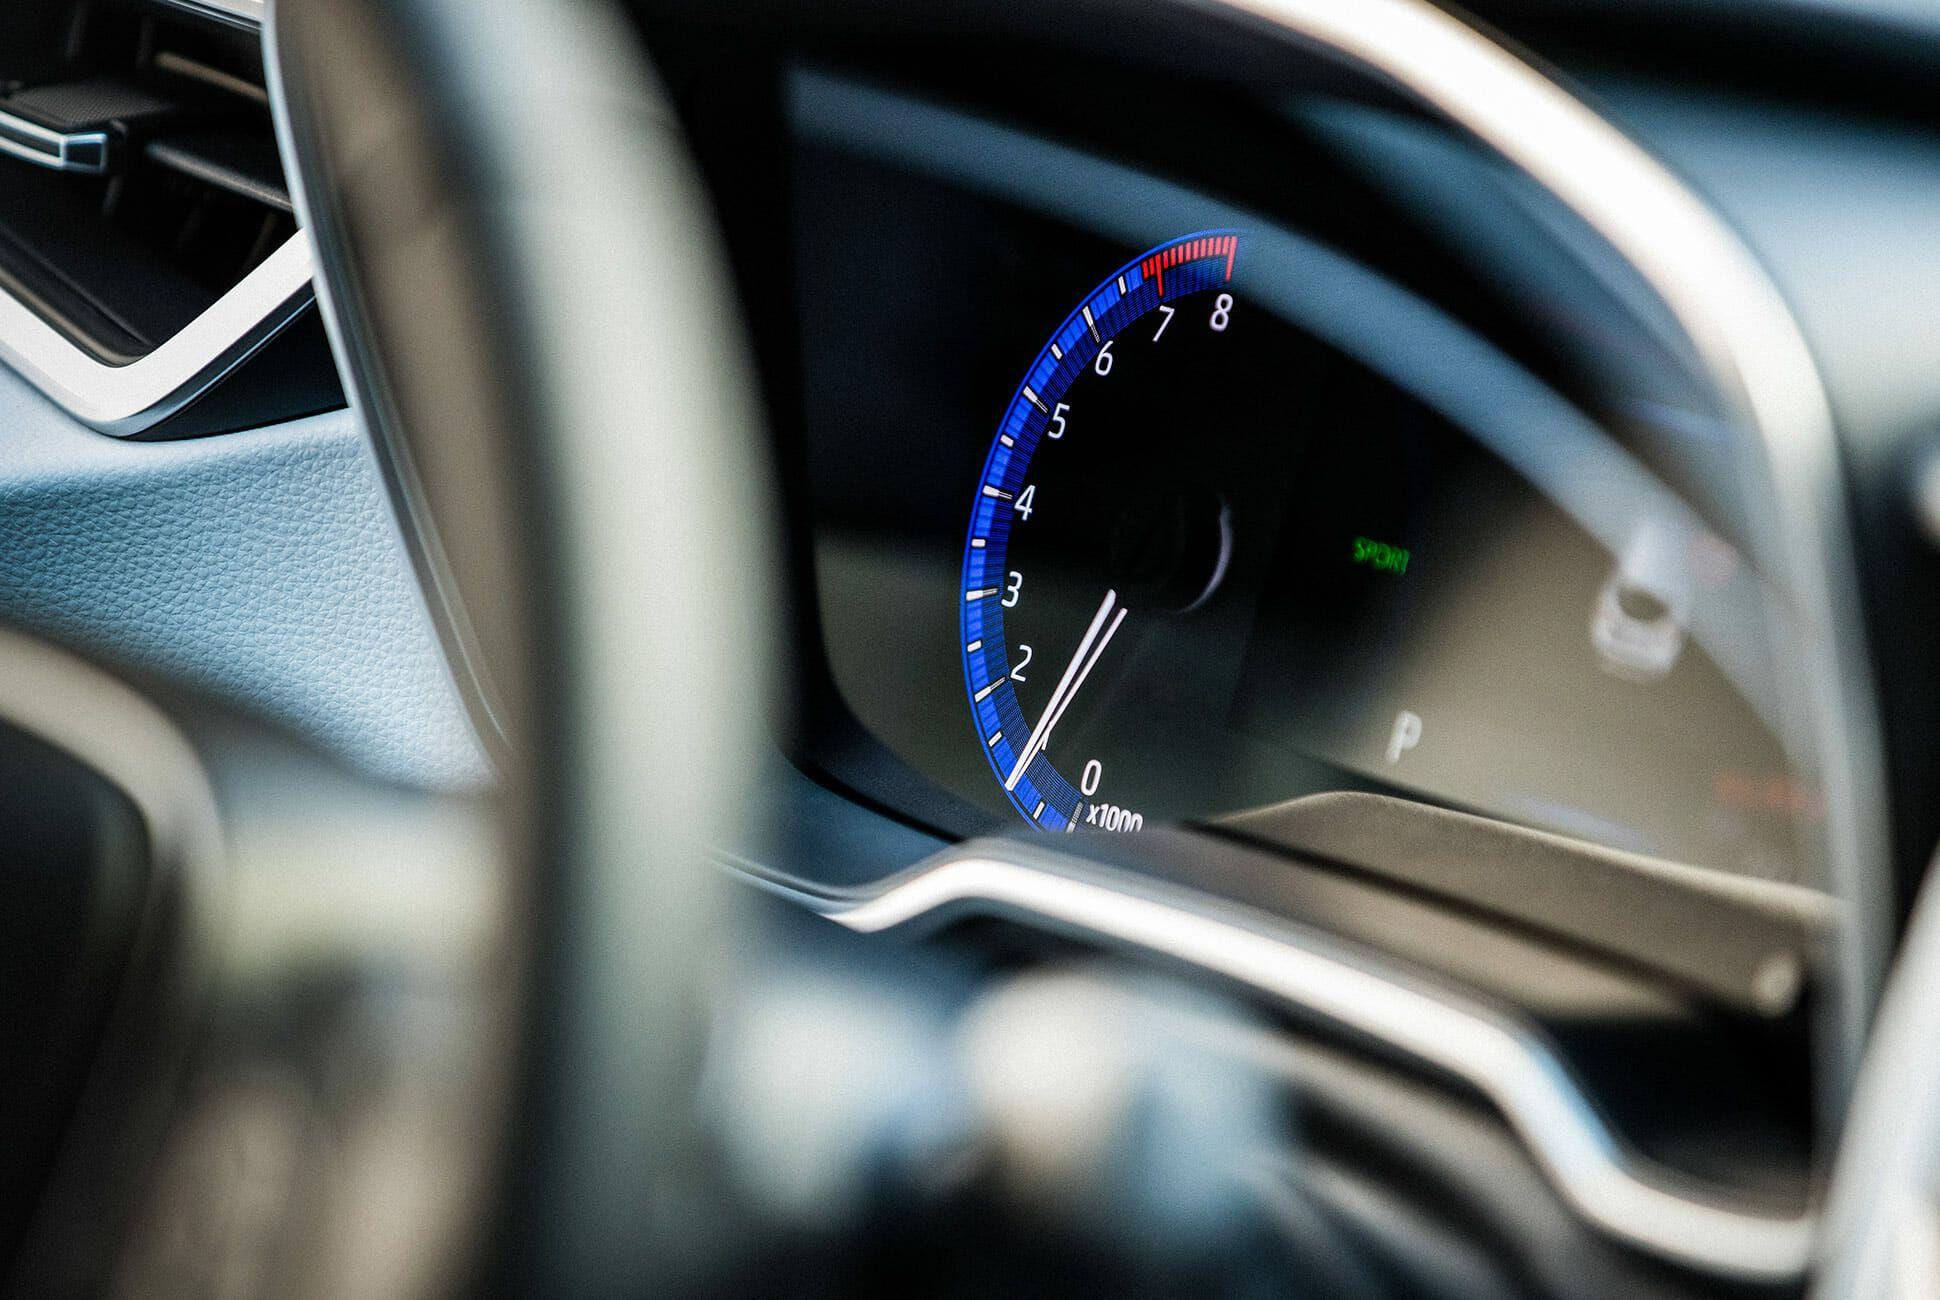 Toyota-Corolla-XSE-Hatch-Review-gear-patrol-slide-10